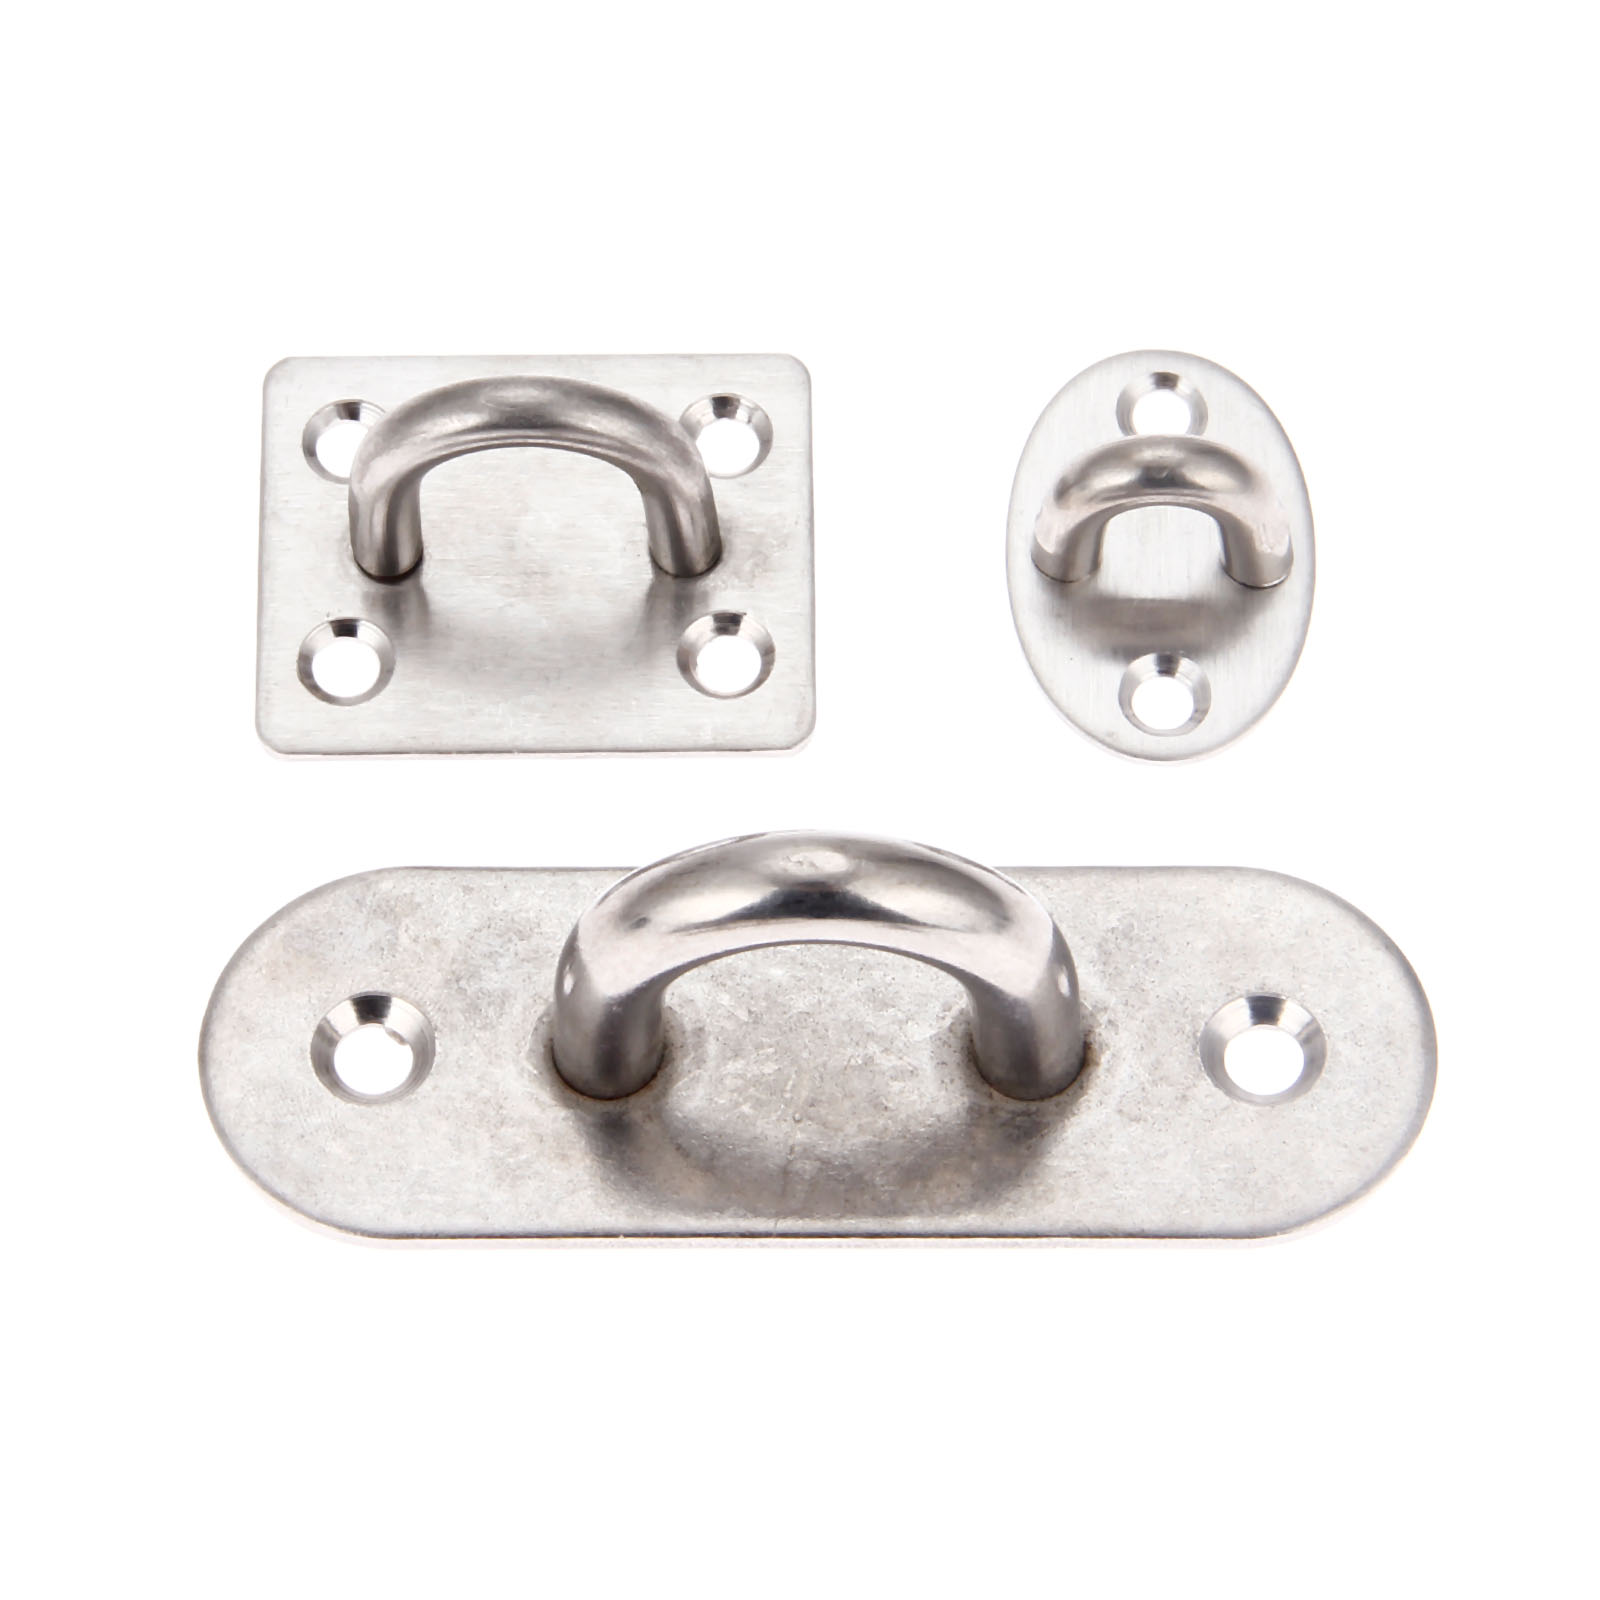 DRELD 1Pc Stainless Steel U-shaped Ceiling Mount Hook Base Ceiling Fans/Leisure Sofa/Sandbags/Hammocks/Rings Fixed Hook